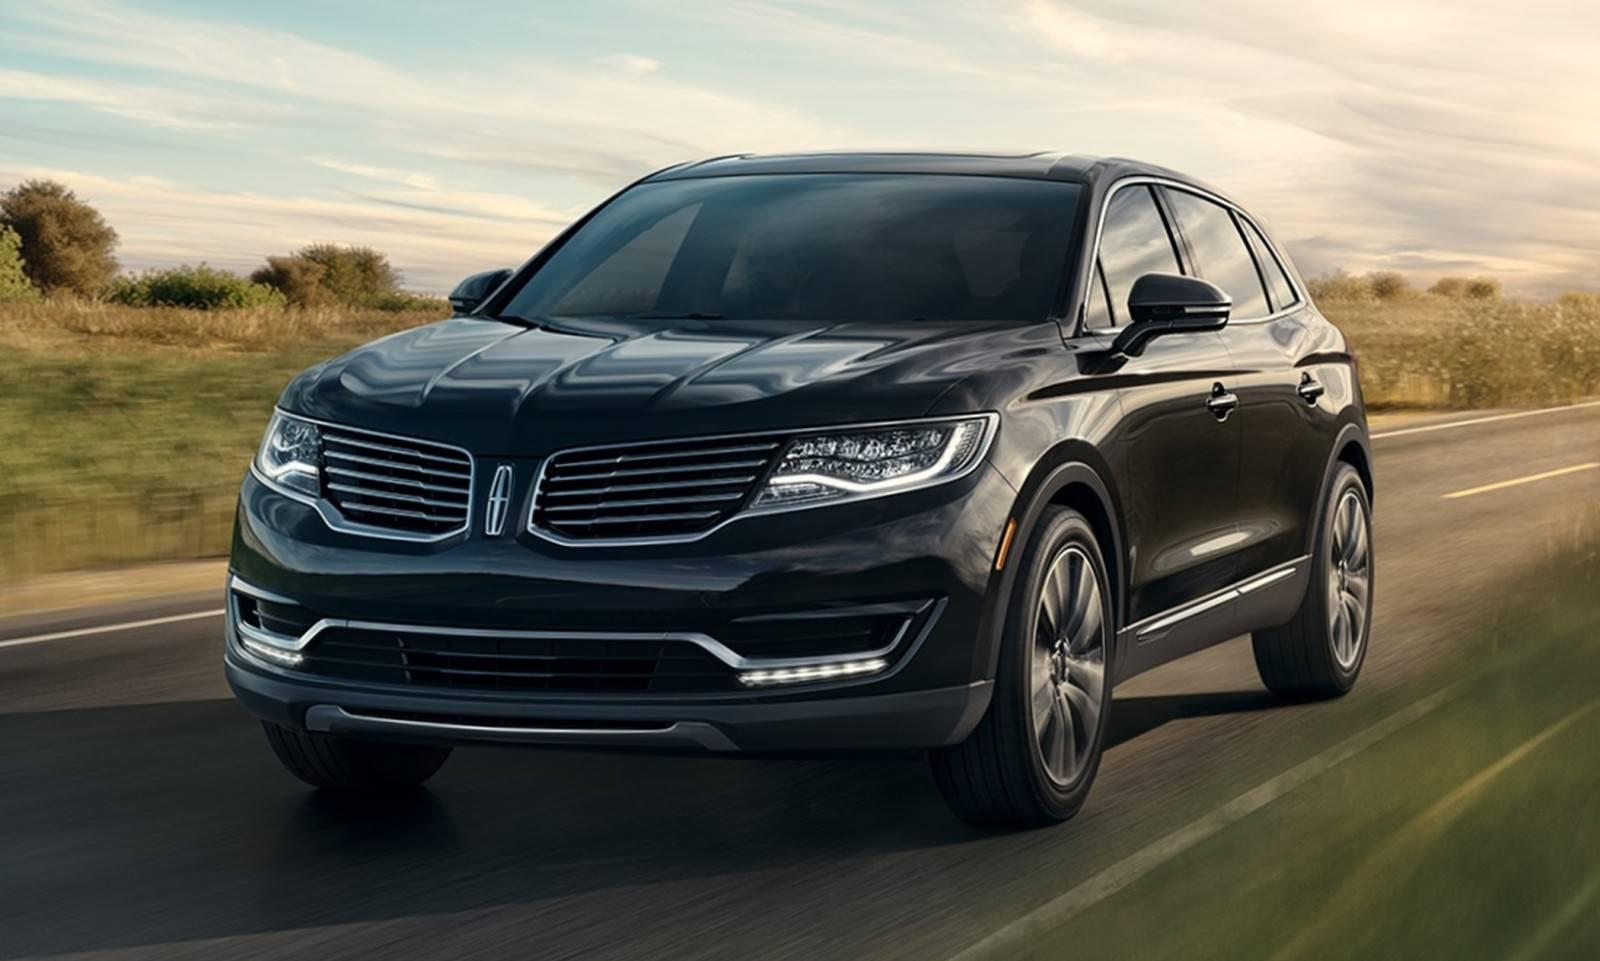 2.7 L Ecoboost V6 >> 2016 Lincoln MKX